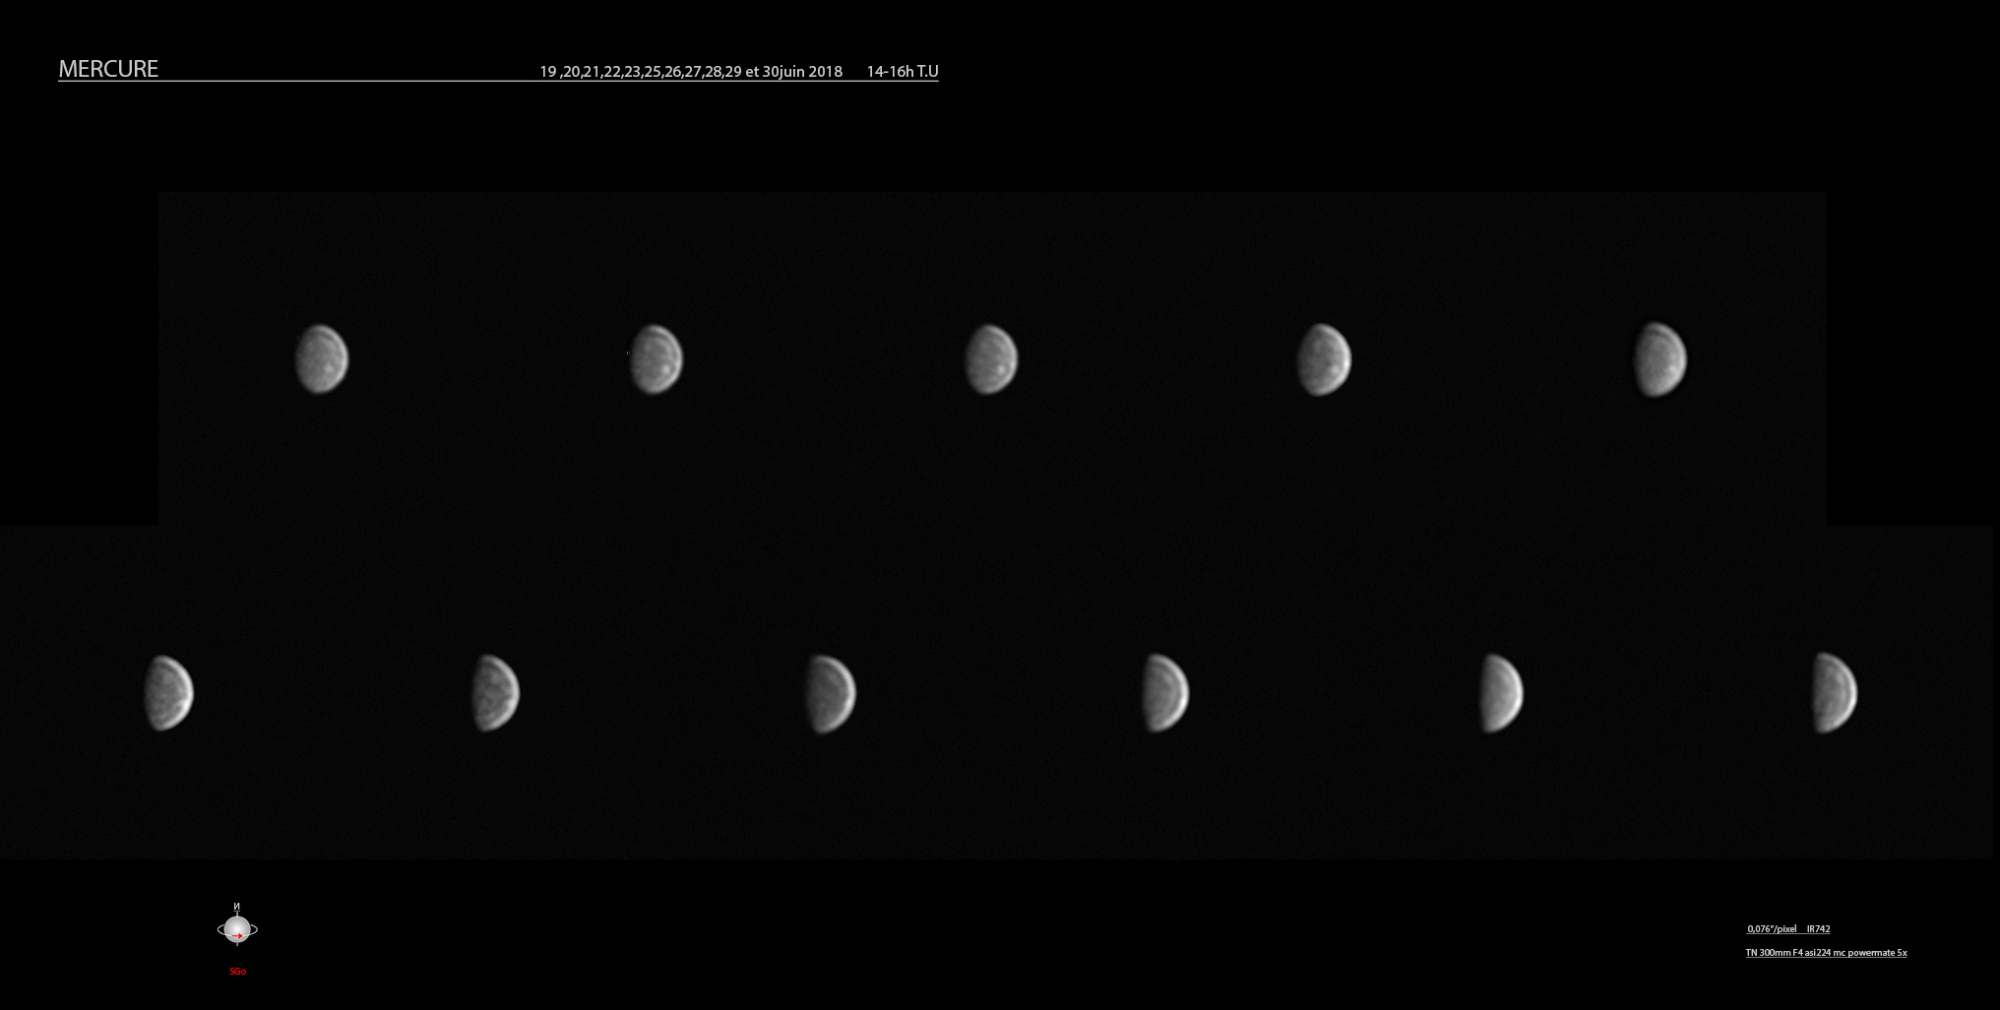 5b386a4865a65_mercuredu19-30juin2018.thumb.jpg.10da59e03e5e2c3bf42b915d0193753a.jpg